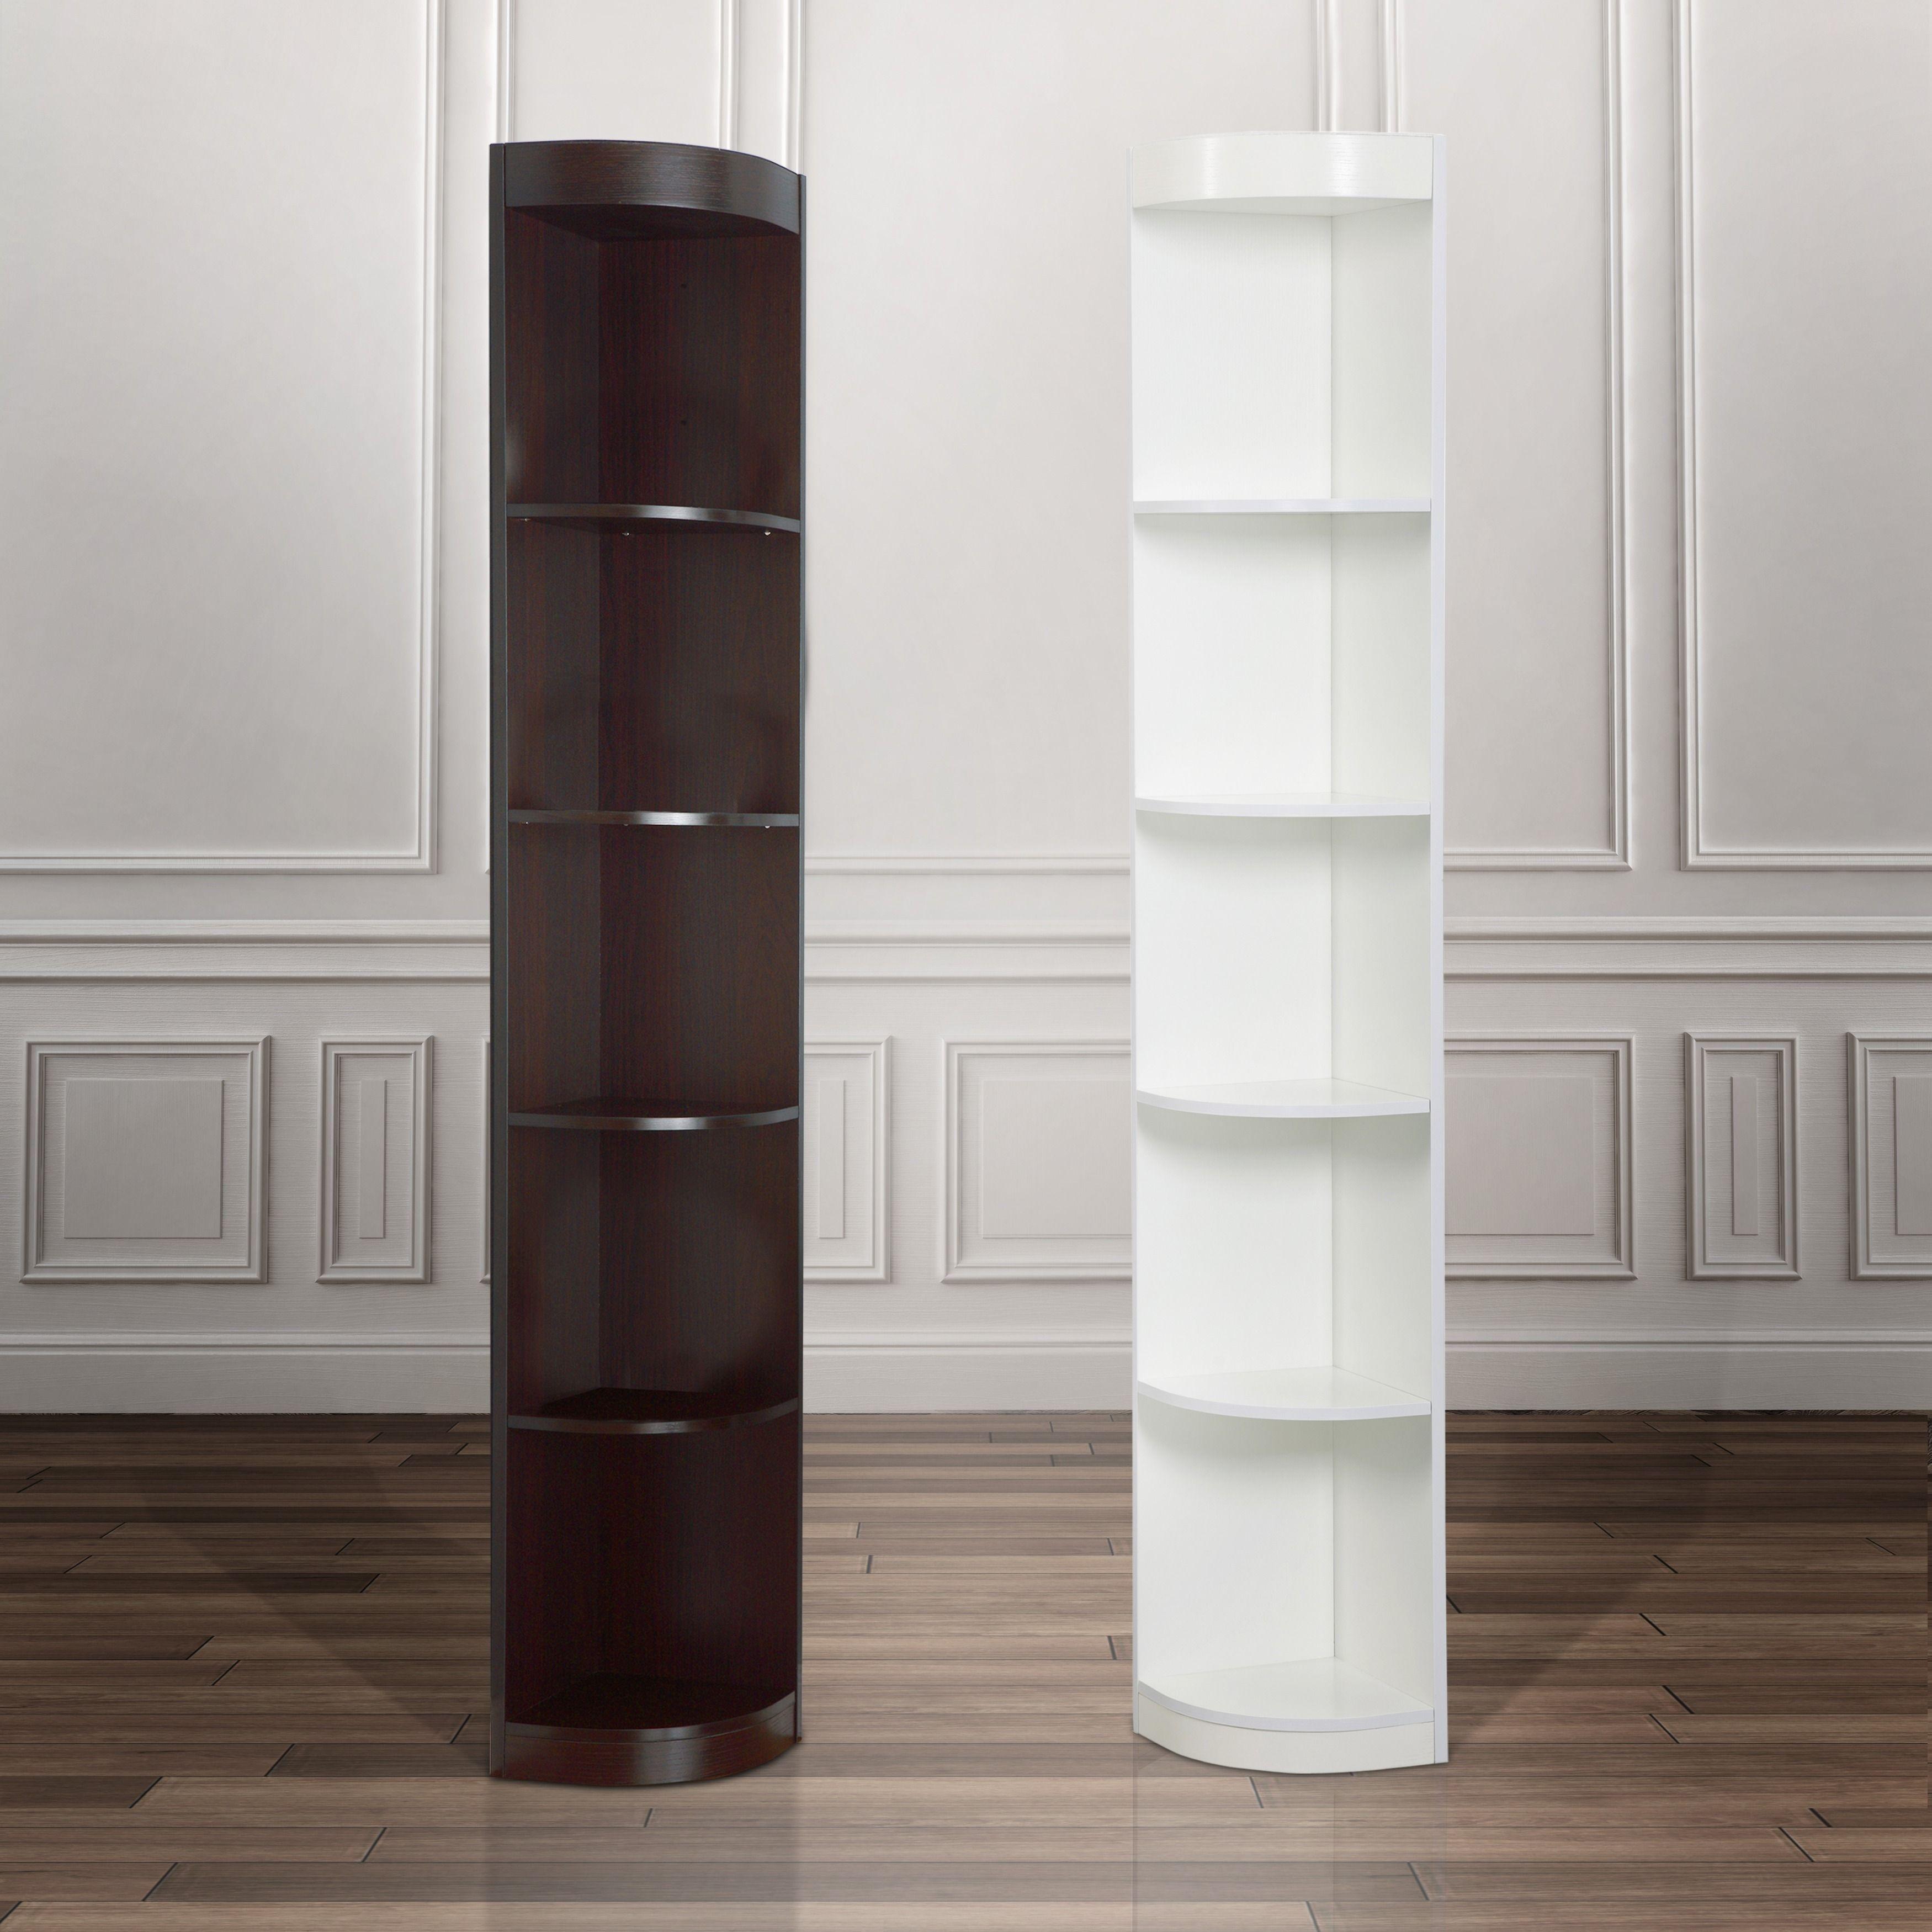 Furniture Of America Corner 5 Shelf Display Stand Dark Walnut Brown